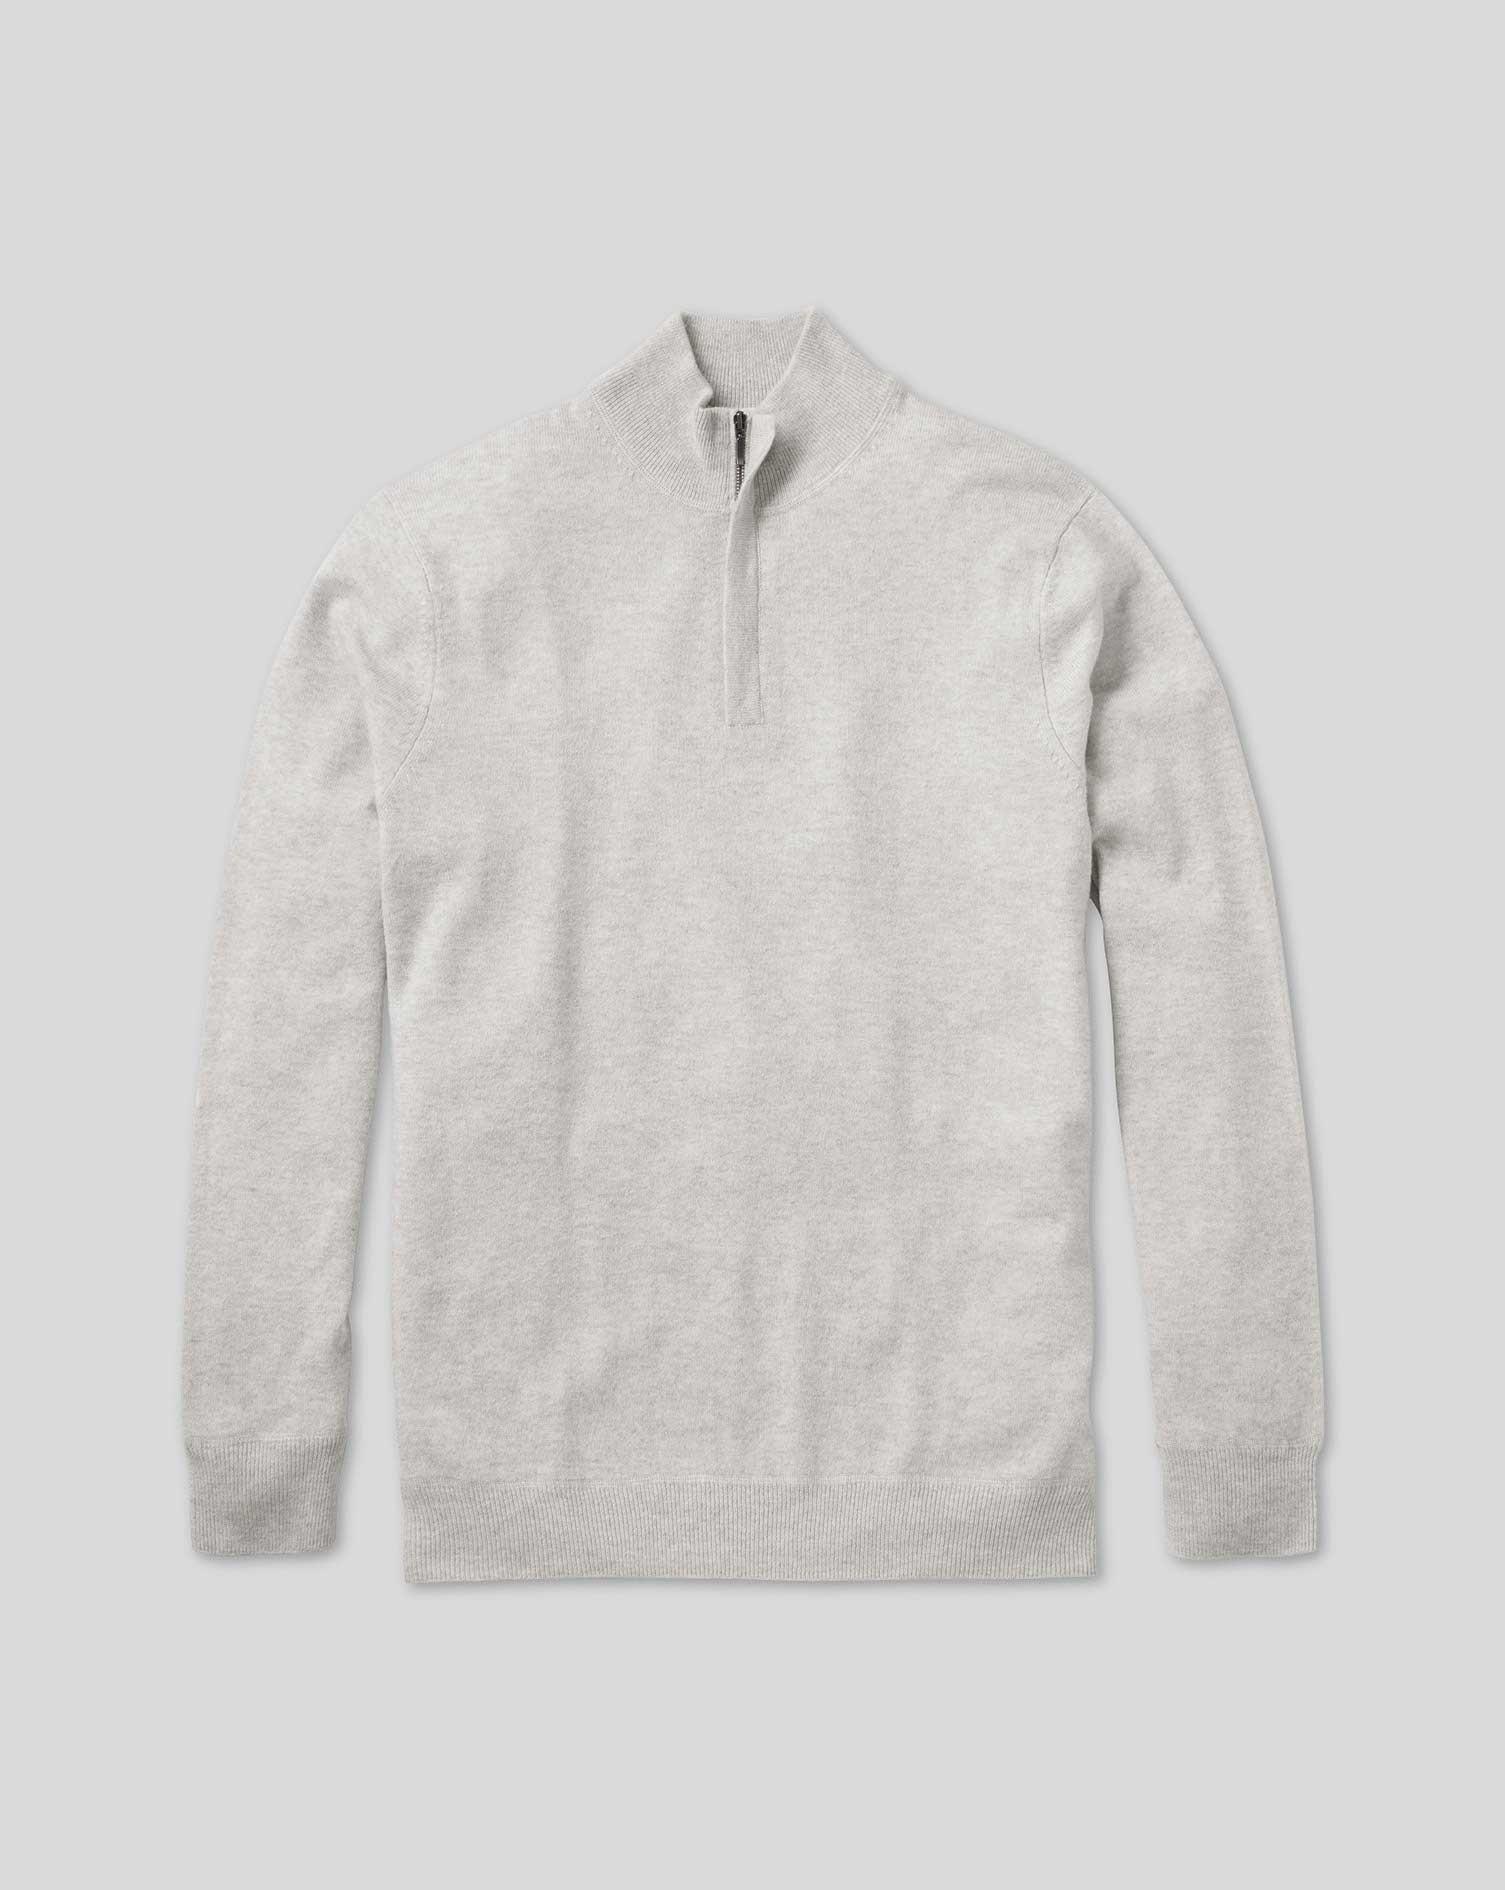 Silver Grey Merino Cashmere Zip Neck Jumper Size XS by Charles Tyrwhitt